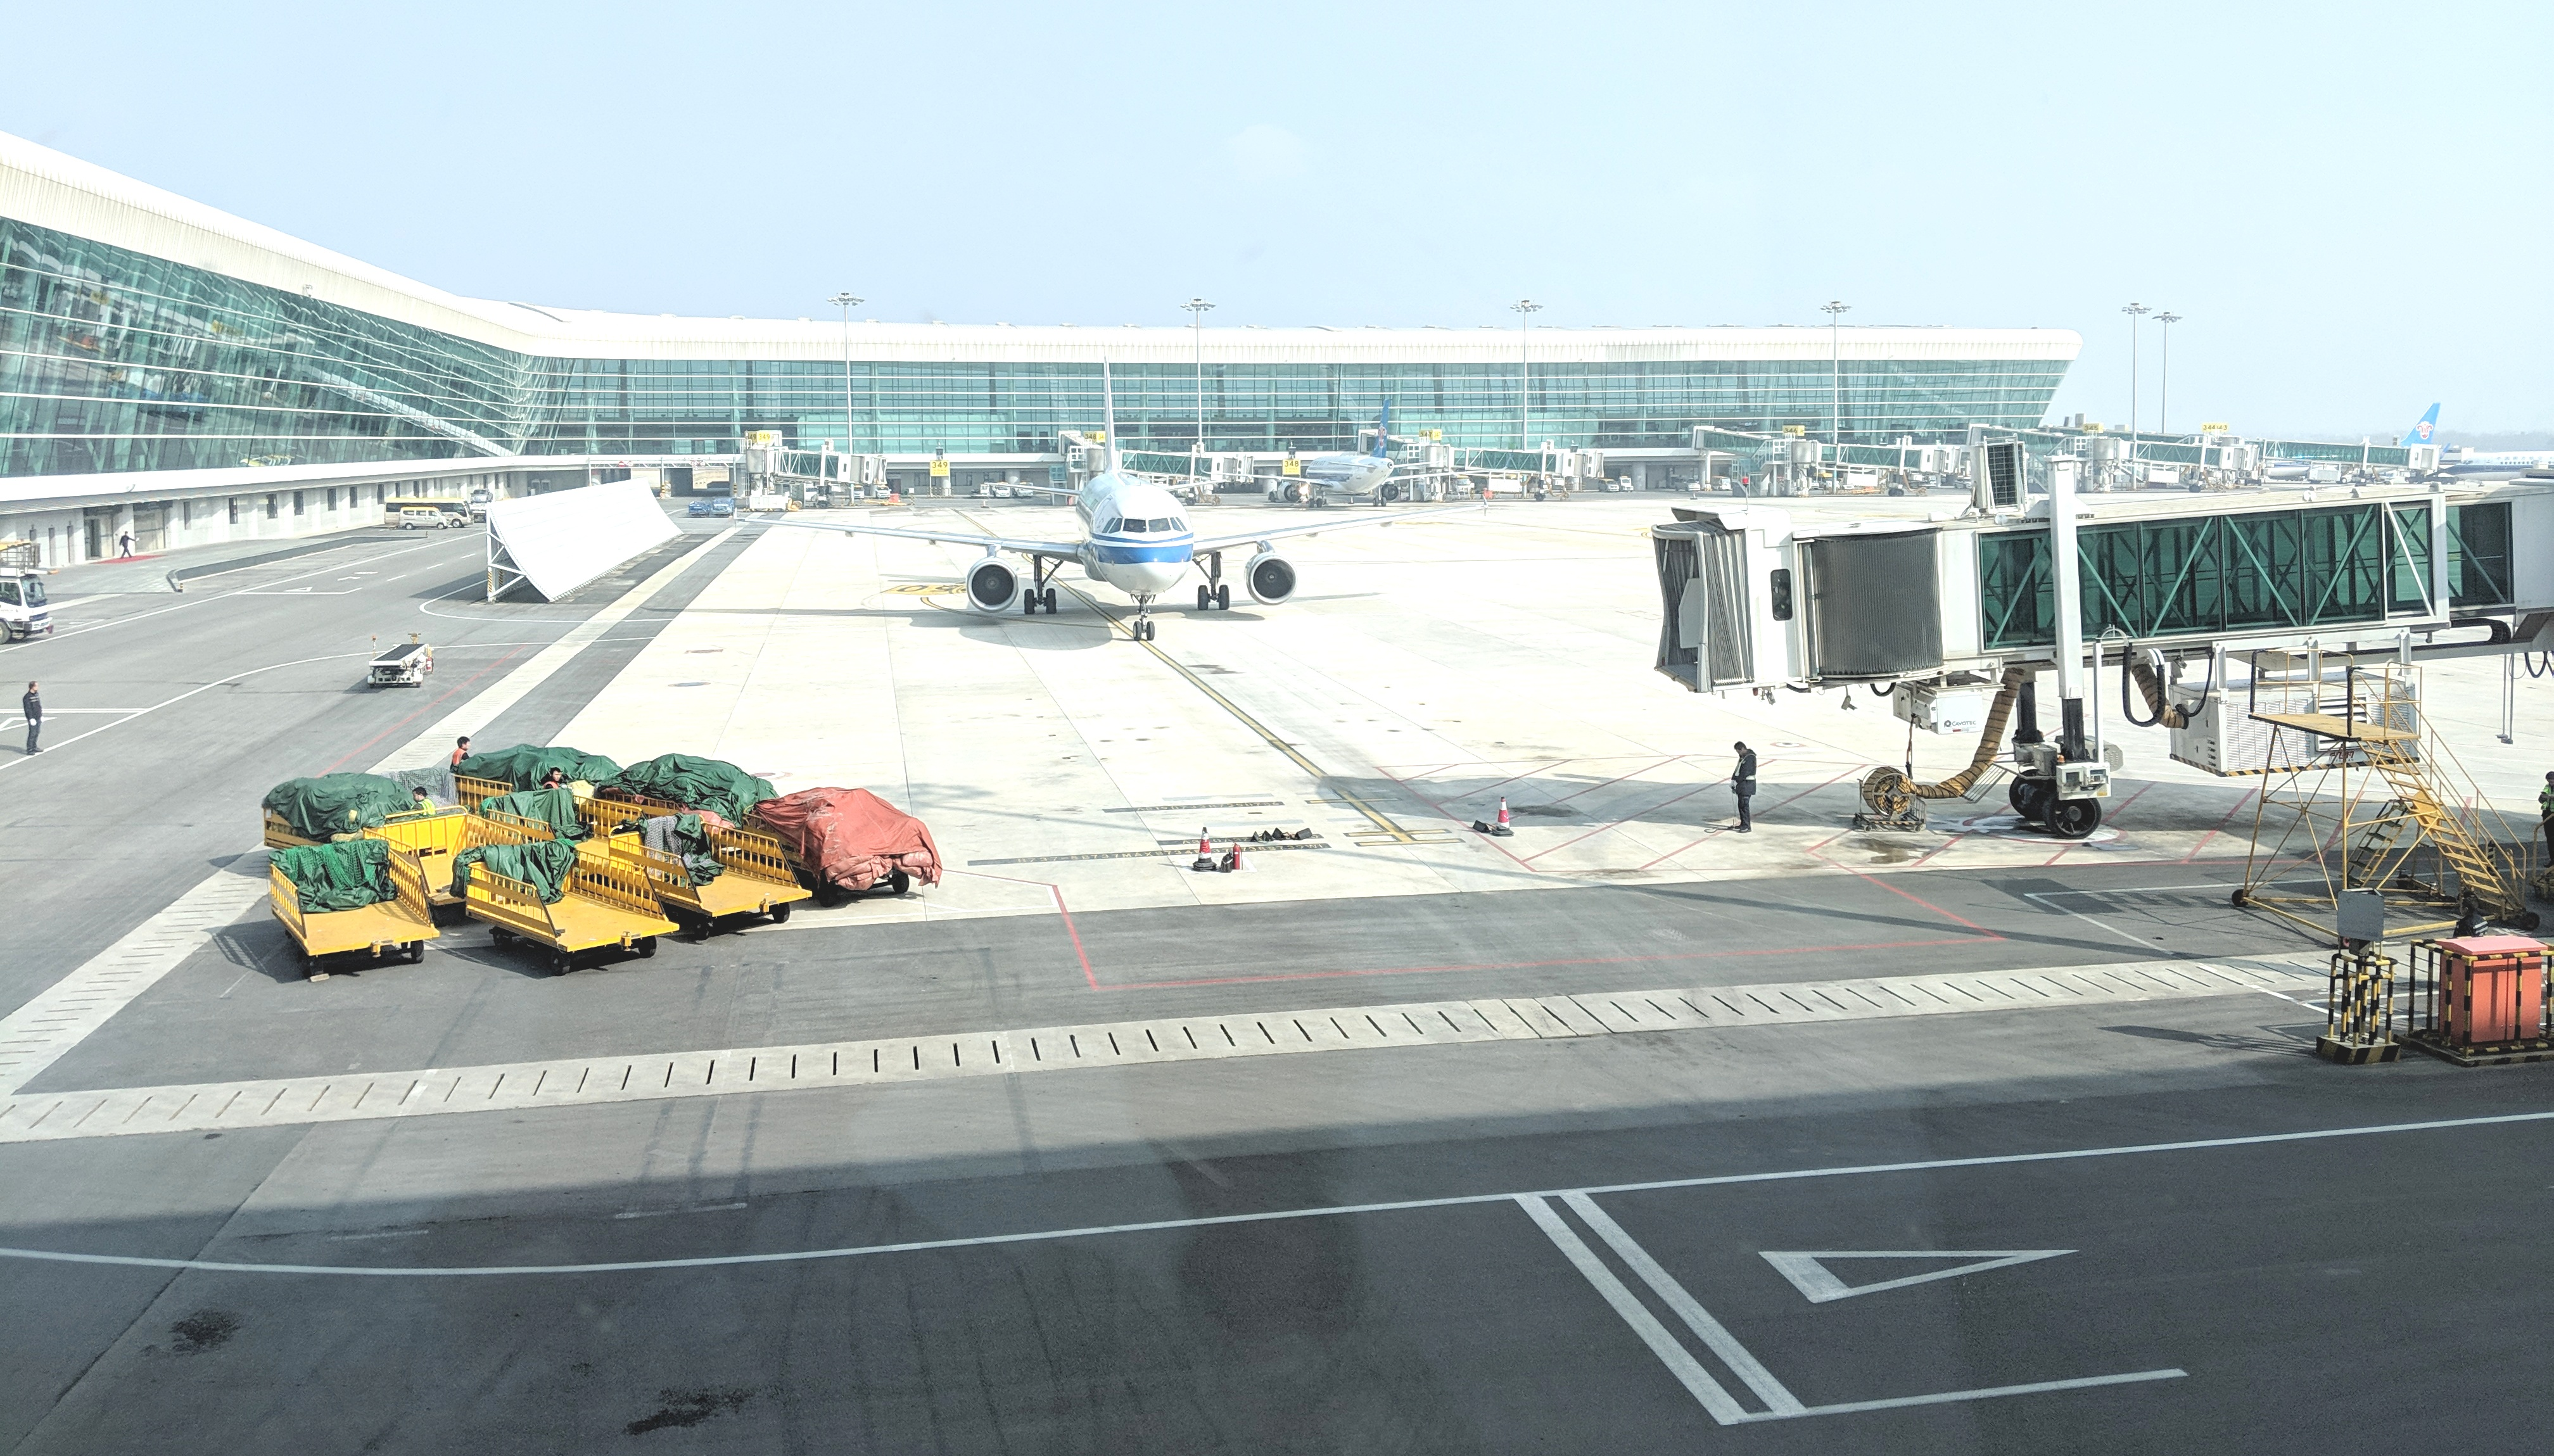 AW-Wk-Wuhan_Tianhe_International_Airport_(武汉天河国际机场)_(WUH)